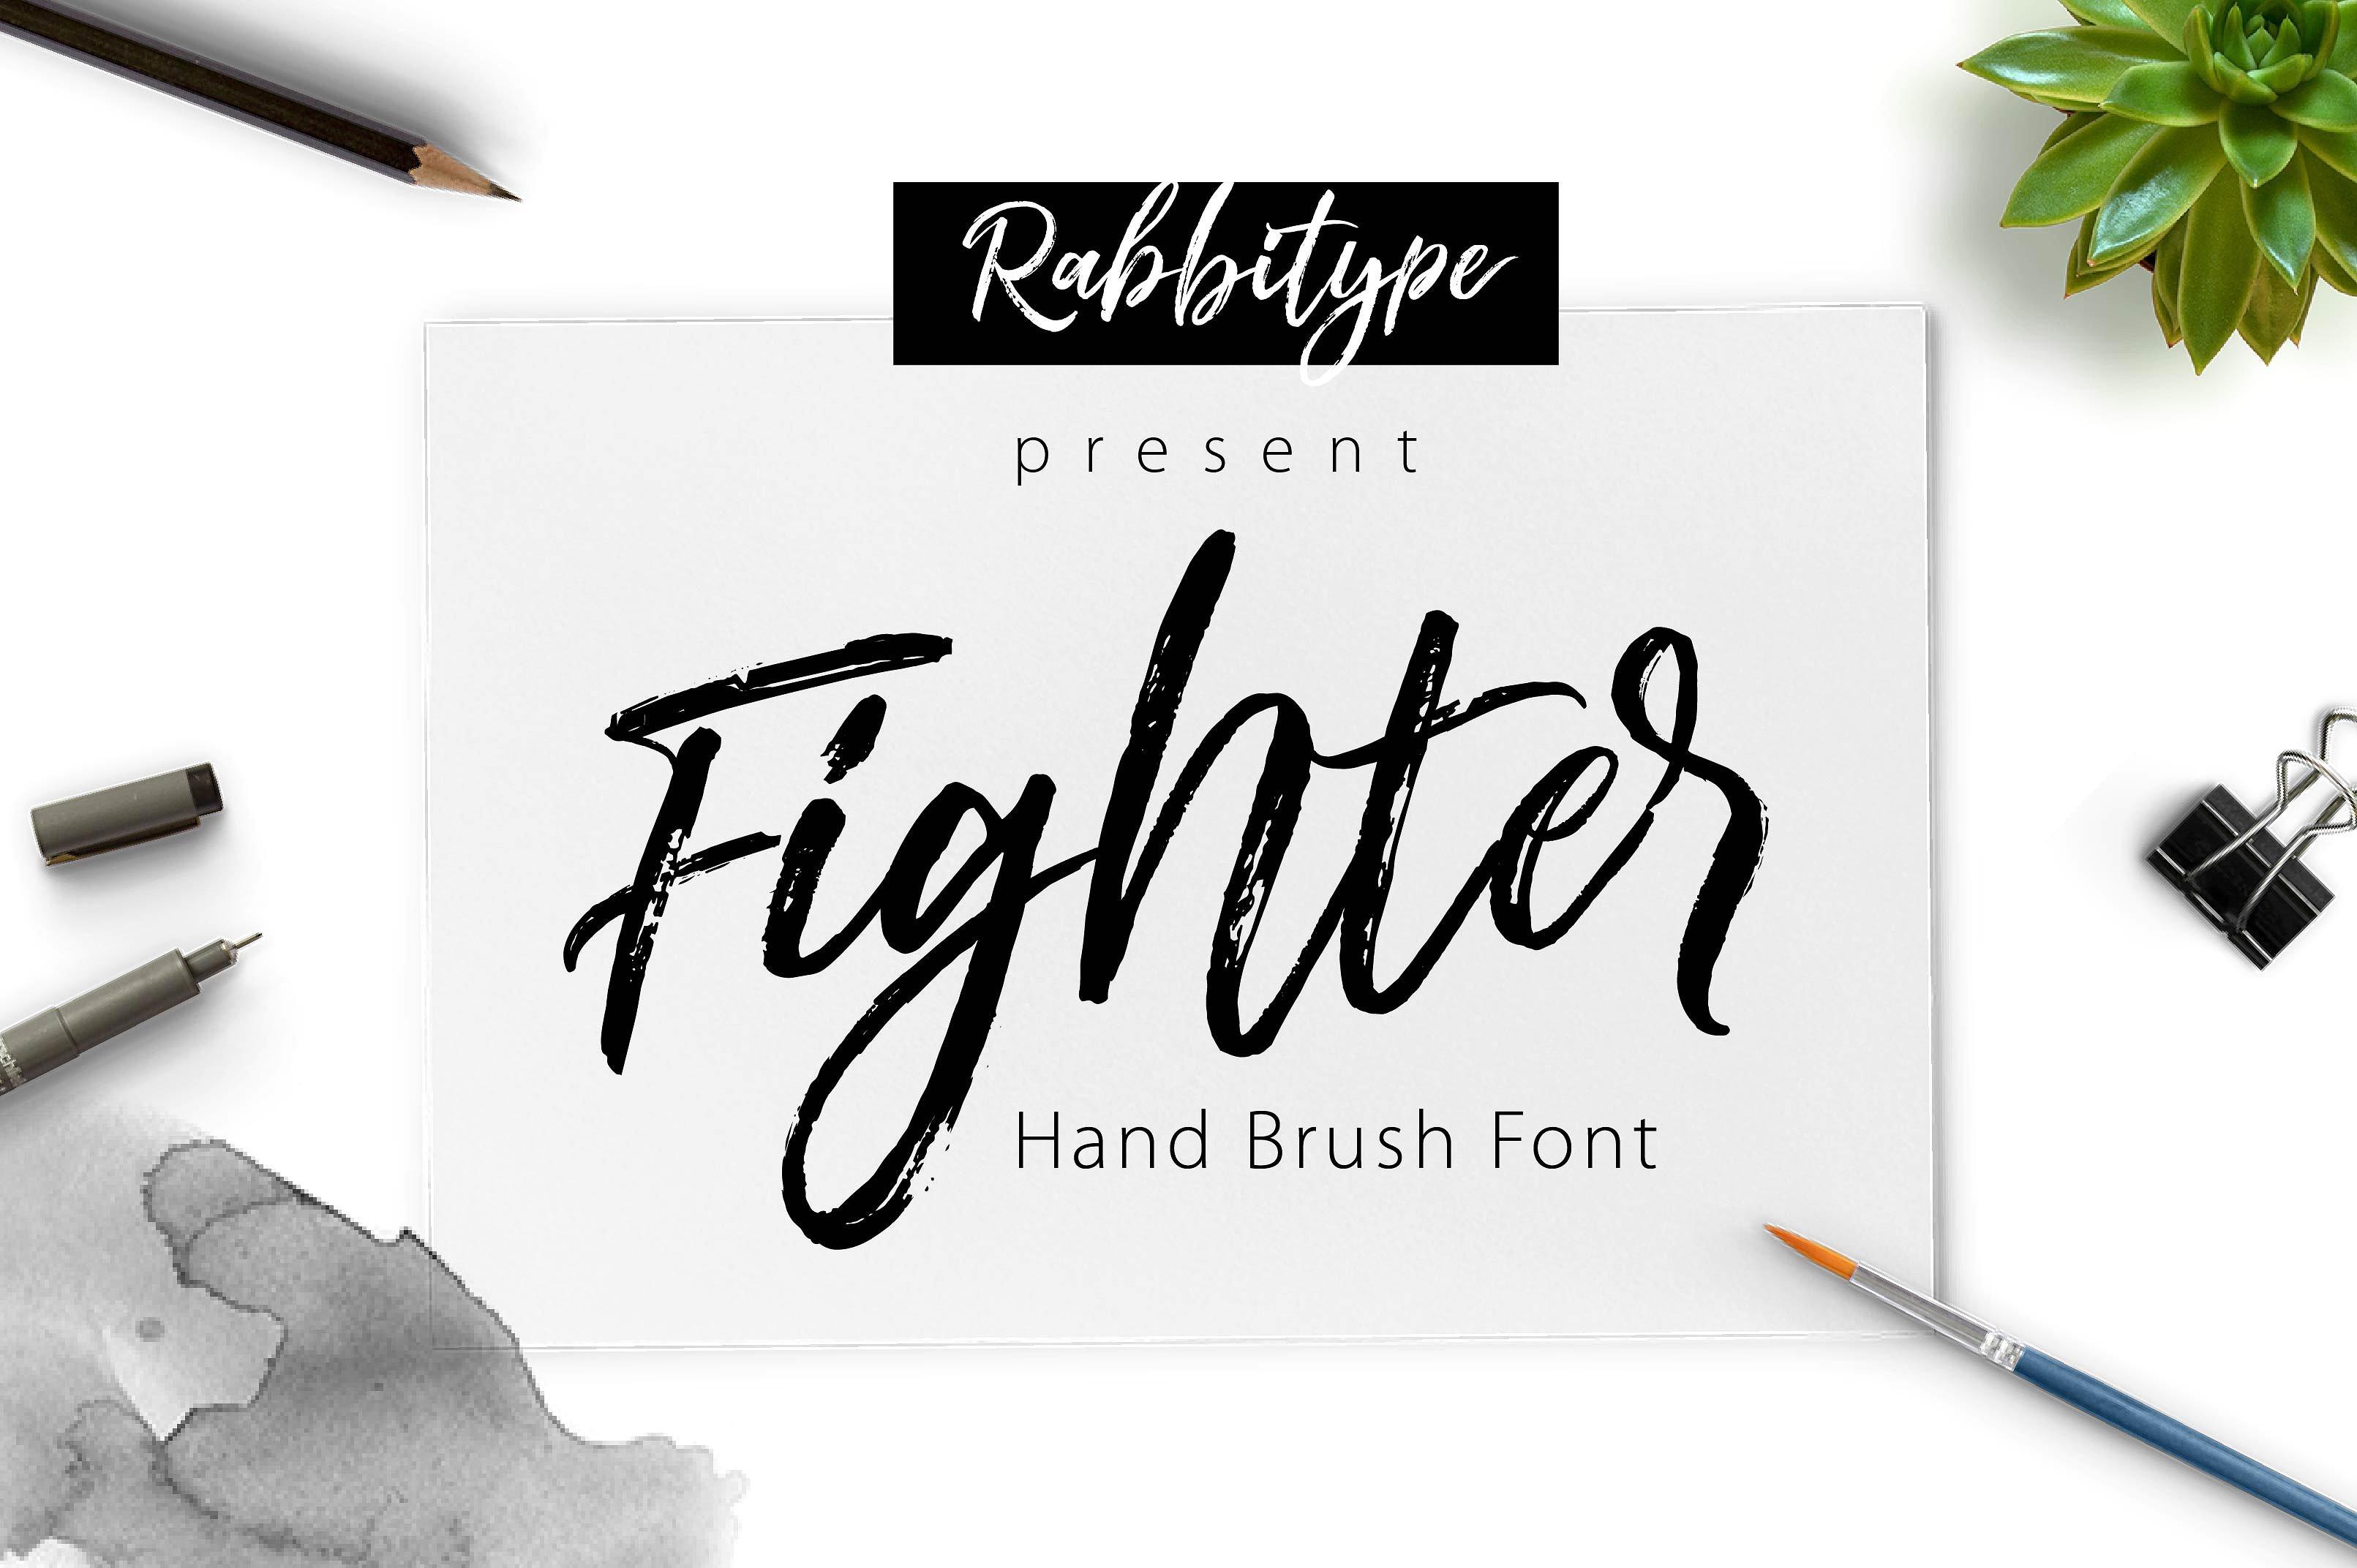 Fighter个性手写笔刷肌理海报英文字体下载